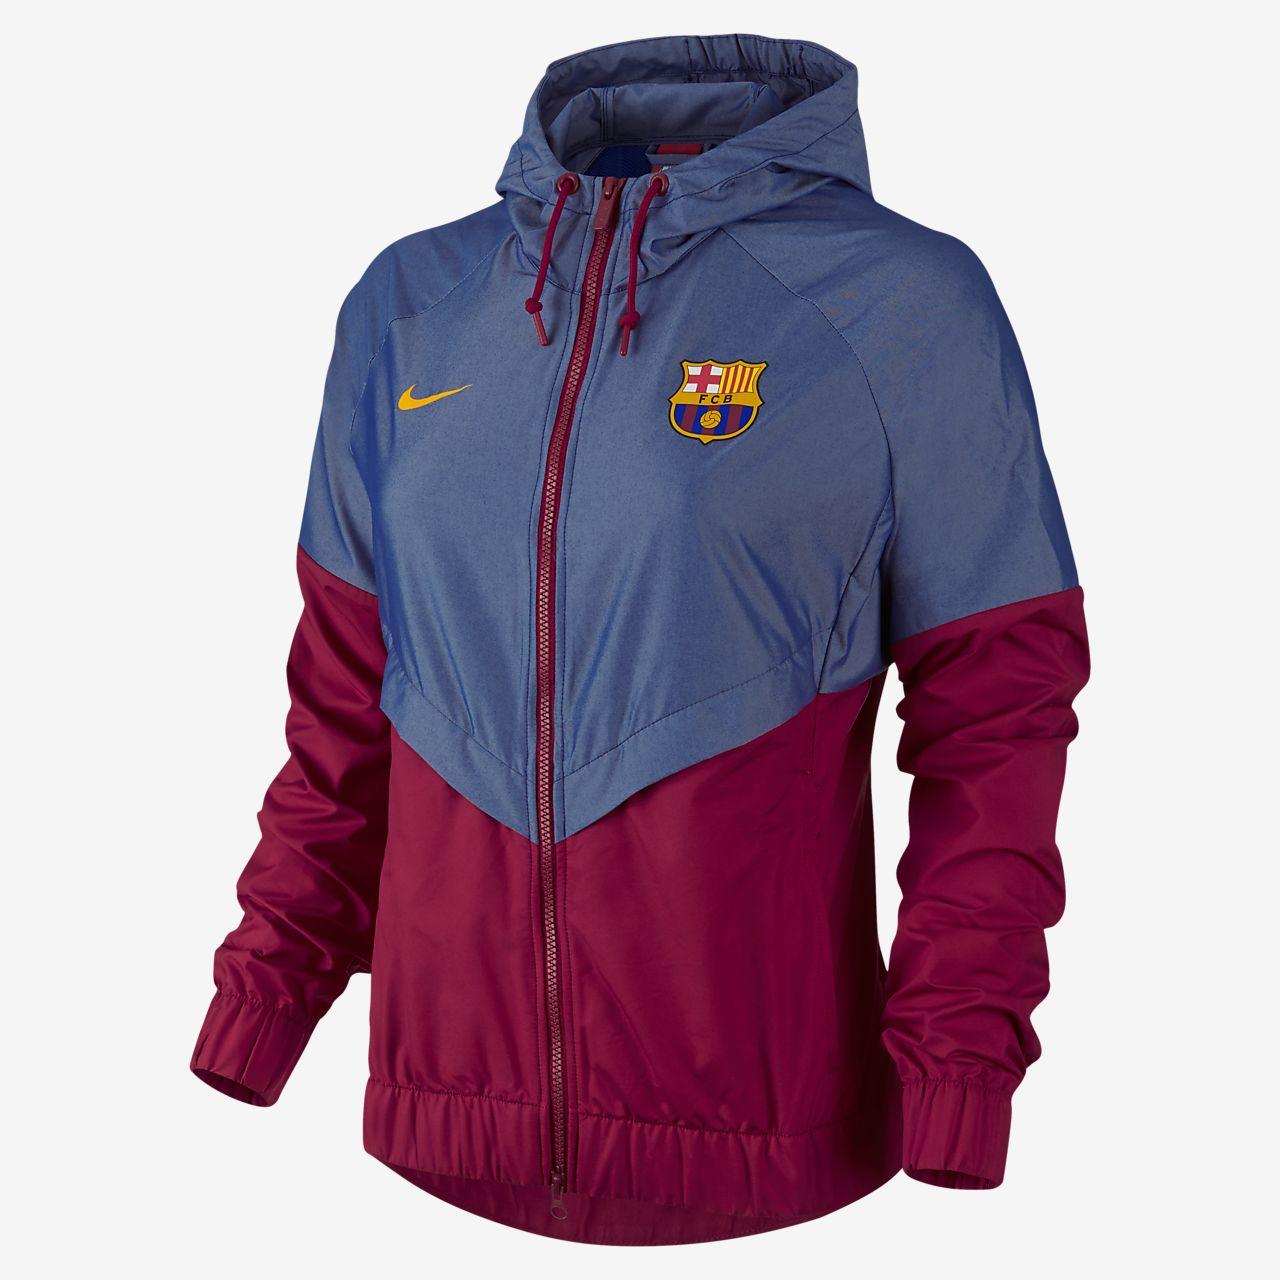 bcc76e3fa89e5 FC Barcelona Authentic Windrunner Chaqueta - Mujer. Nike.com ES